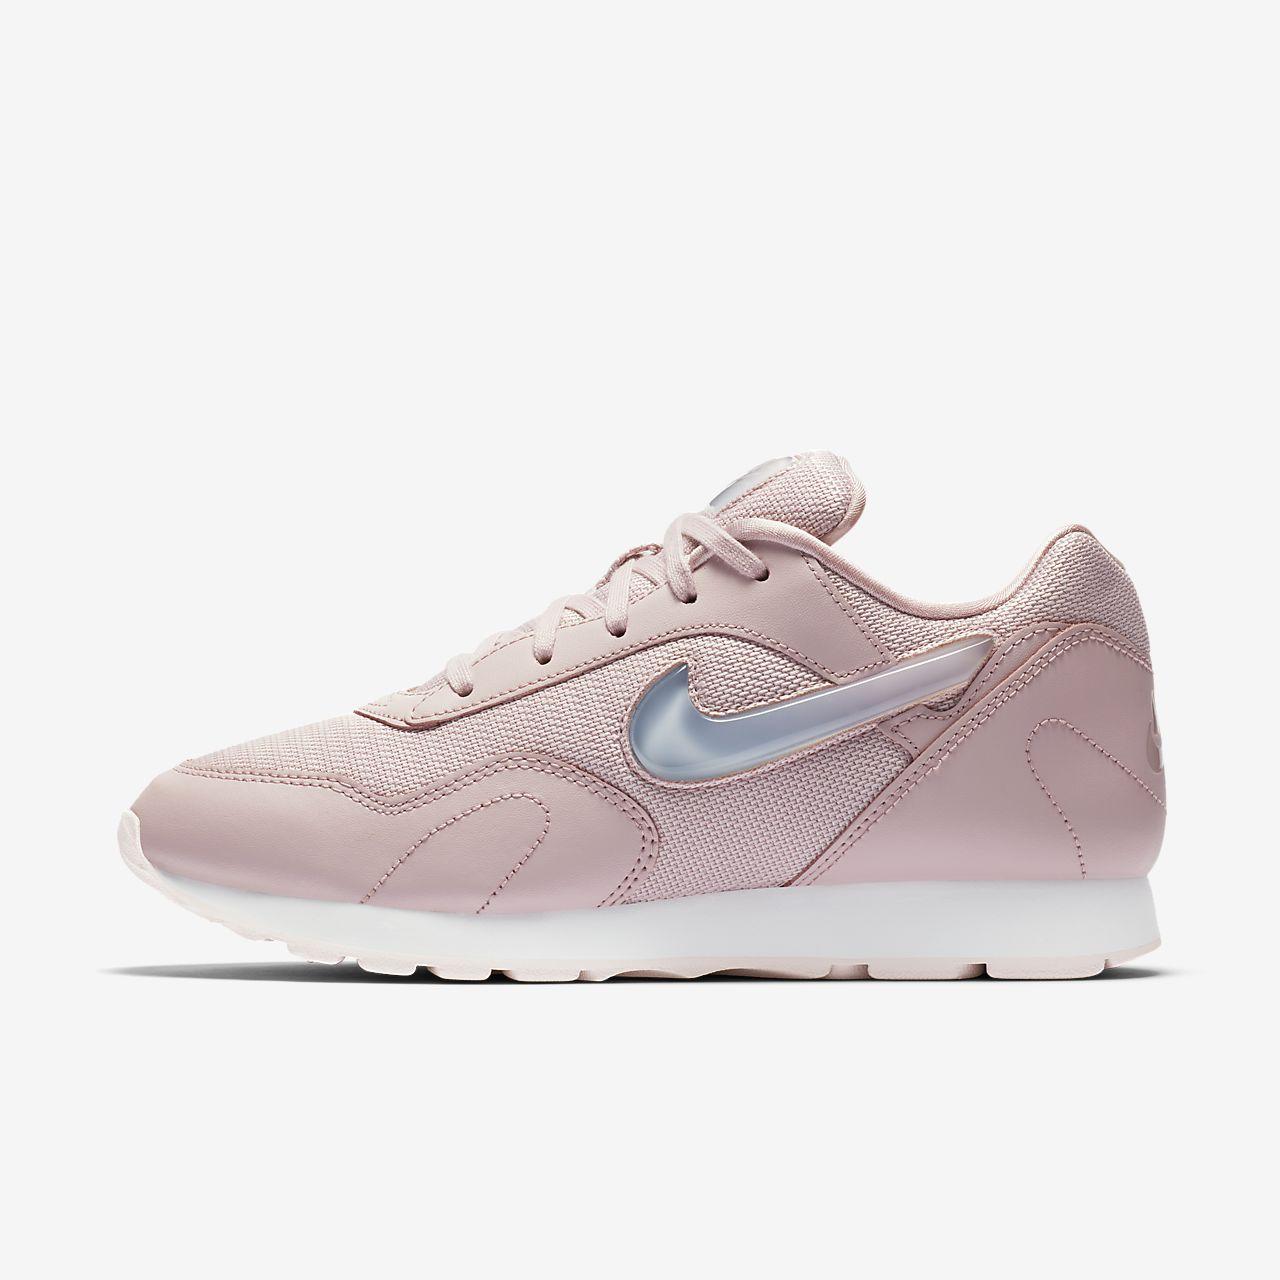 f7d17059af Low Resolution Γυναικείο παπούτσι Nike Outburst Premium Γυναικείο παπούτσι  Nike Outburst Premium